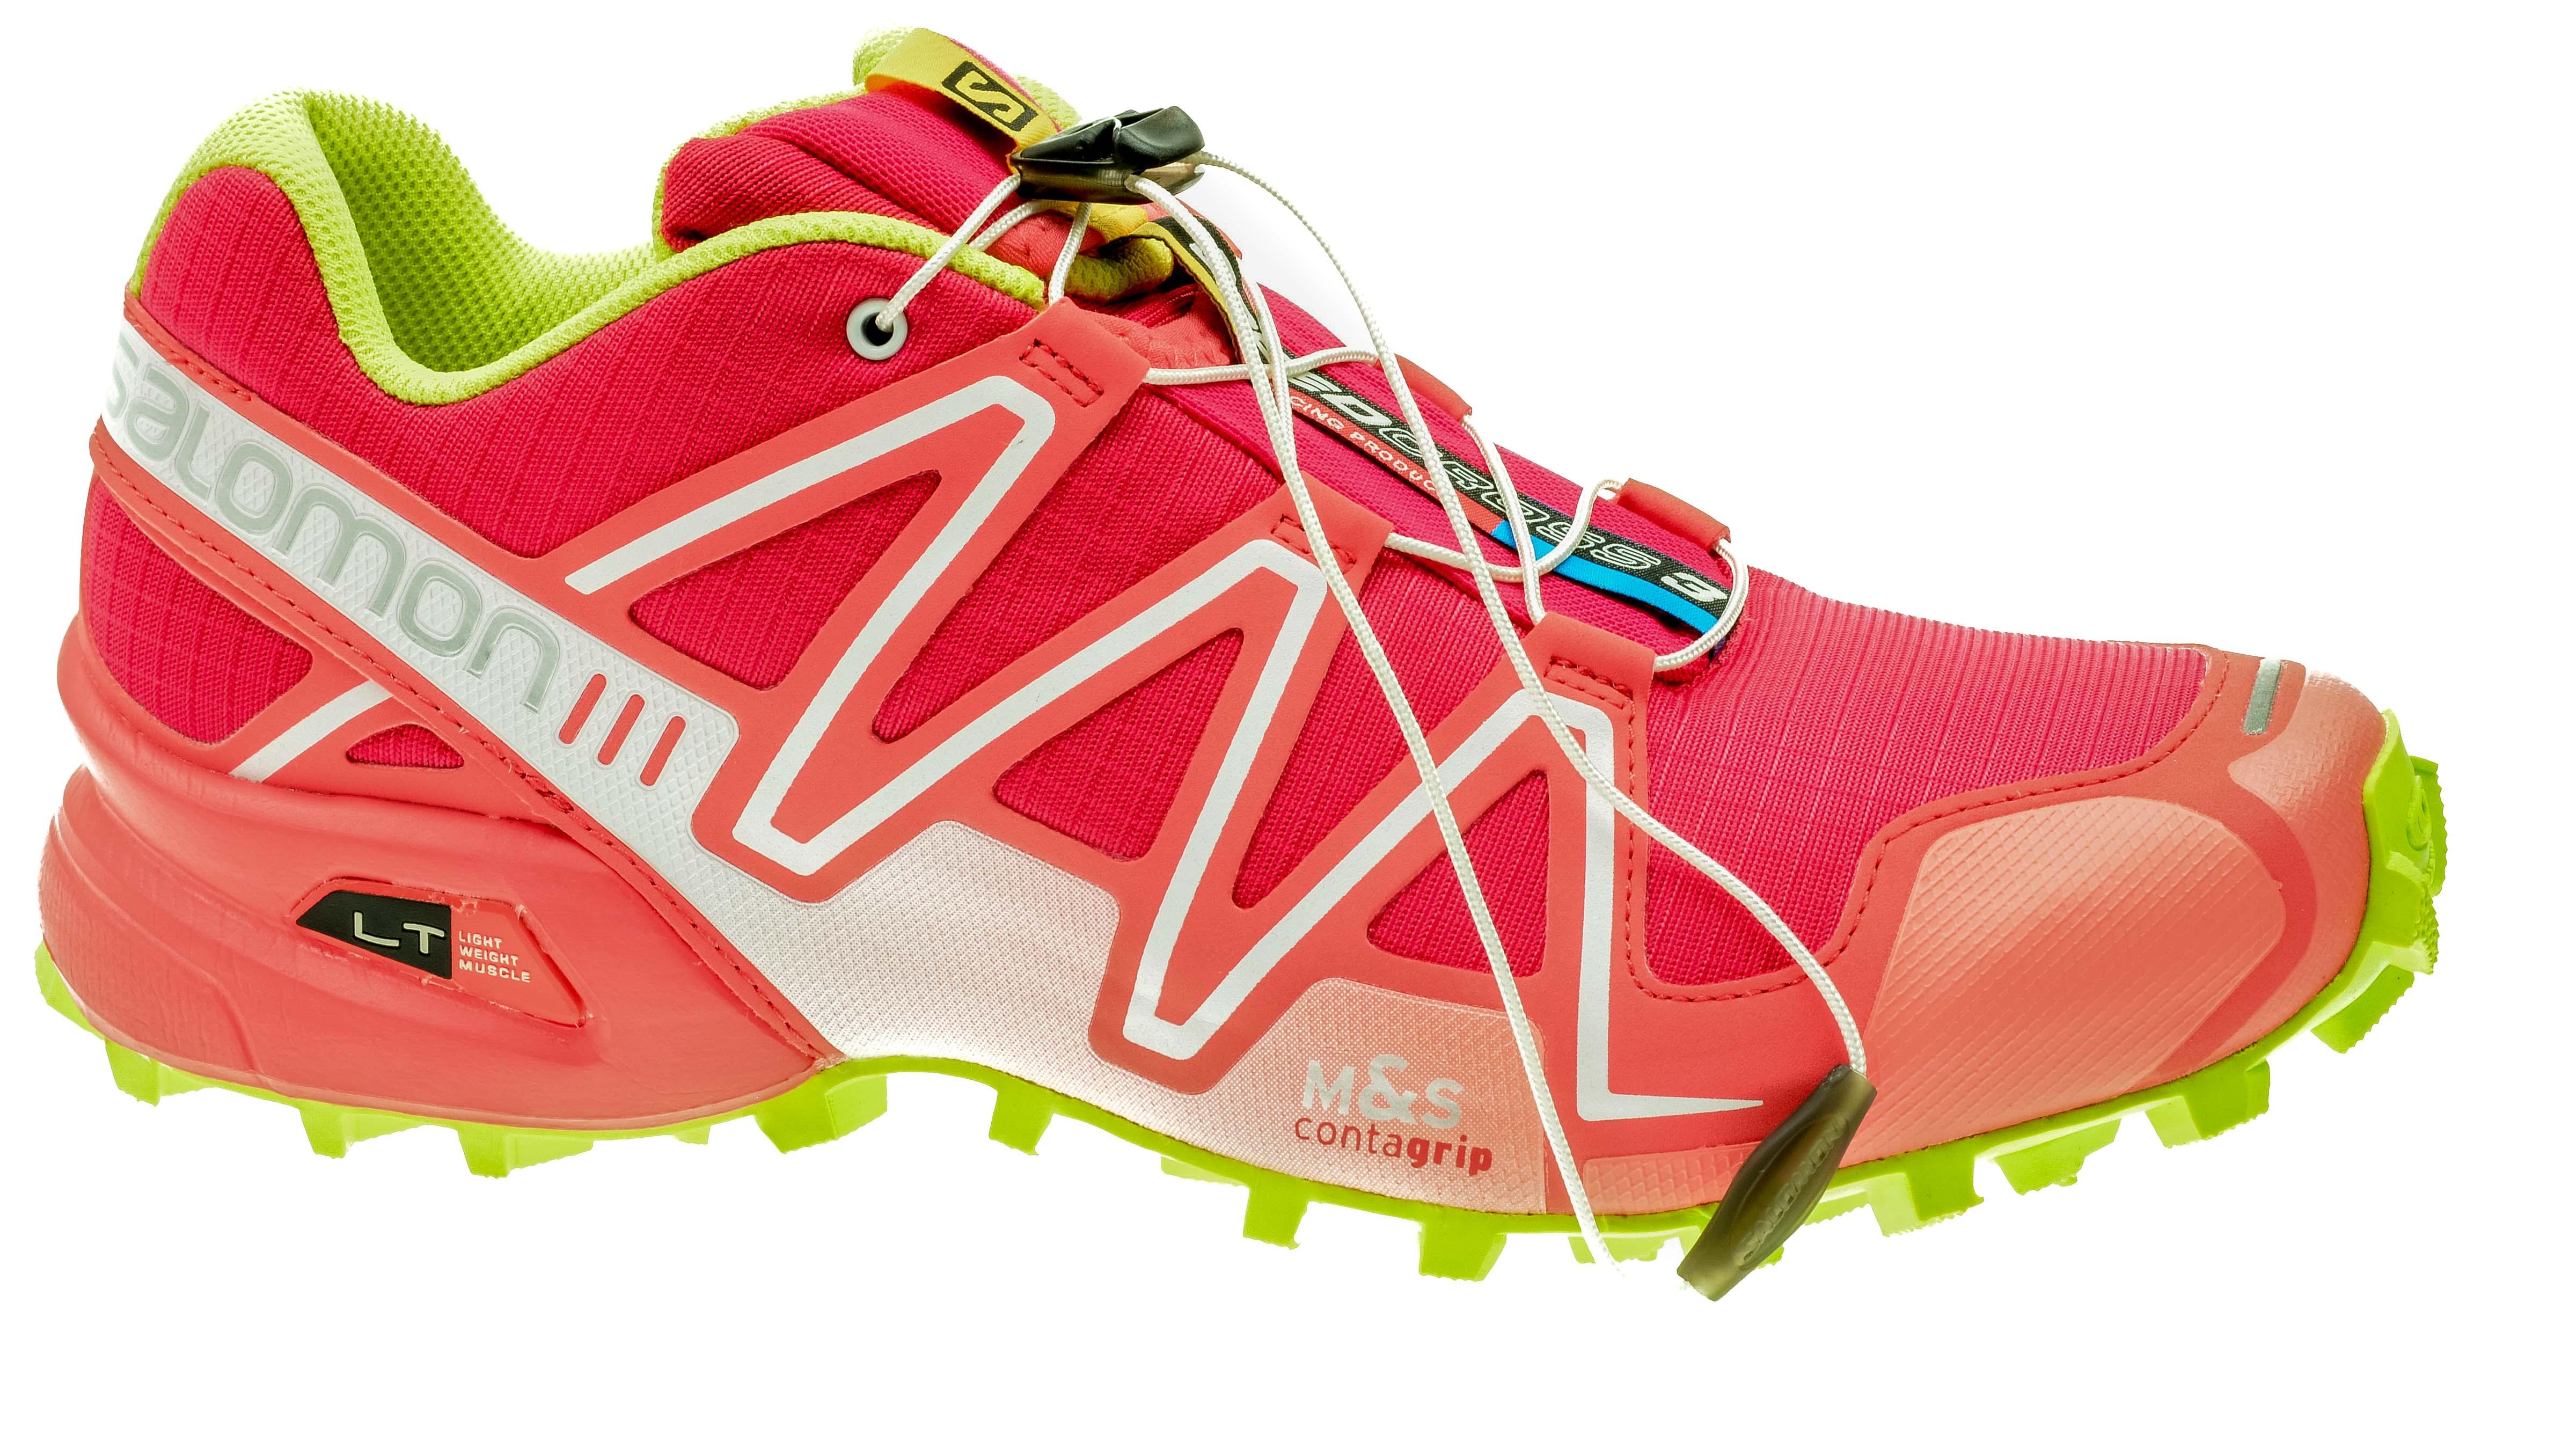 682227825830 Salomon Speedcross 3 W lotus-pink papaya gecko-green bestellen bij  Skate-dump.nl